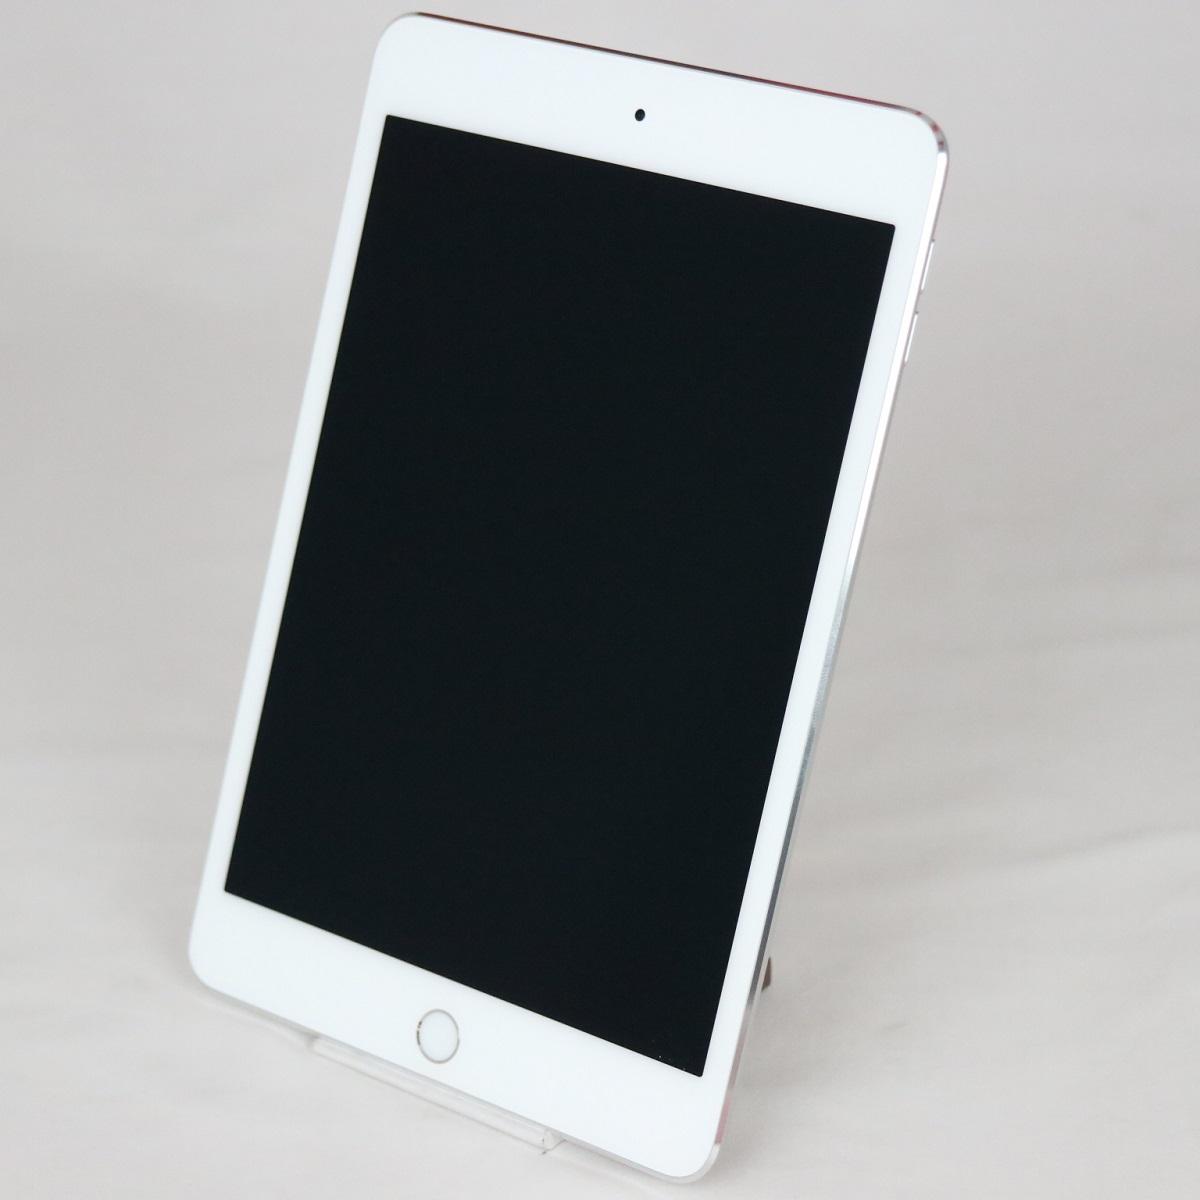 Apple/ iPad mini 4 (MK9P2J/A)/ Wi-Fi/ 7.9インチ/ 128GB/ シルバー